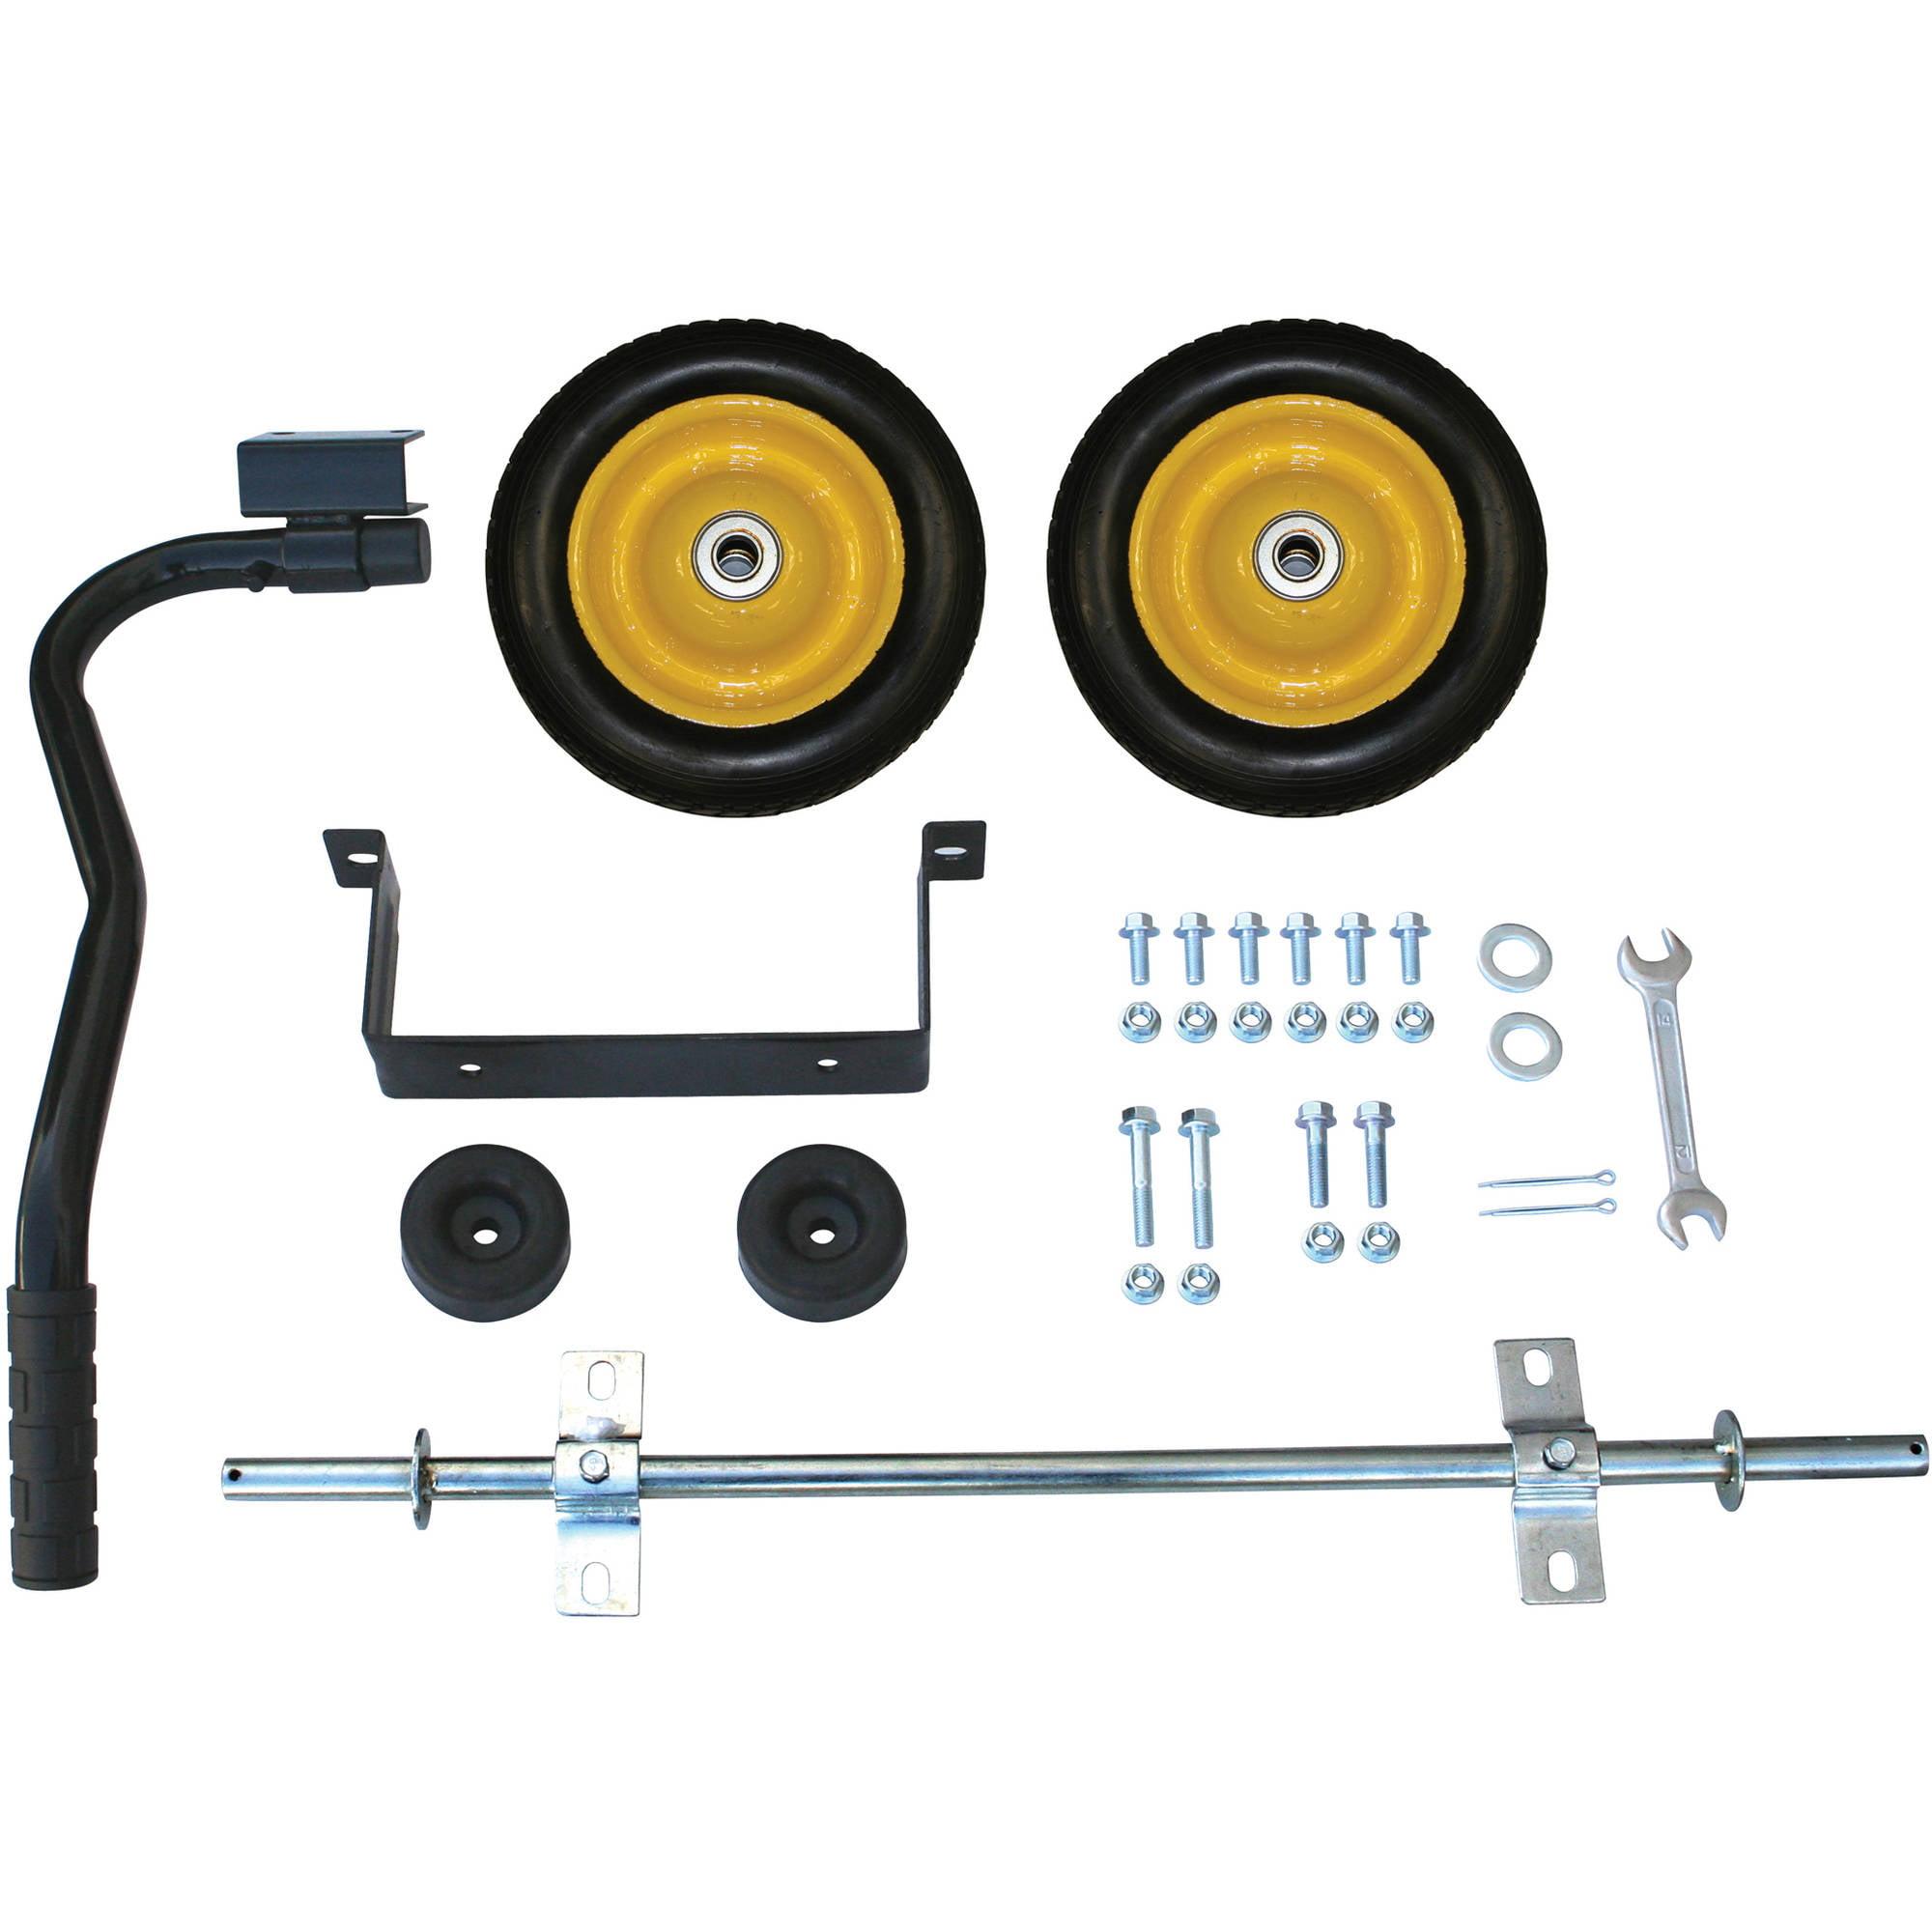 Champion Power Equipment Model C40065 Wheel Kit for Any Champion 4,000 Watt Generators